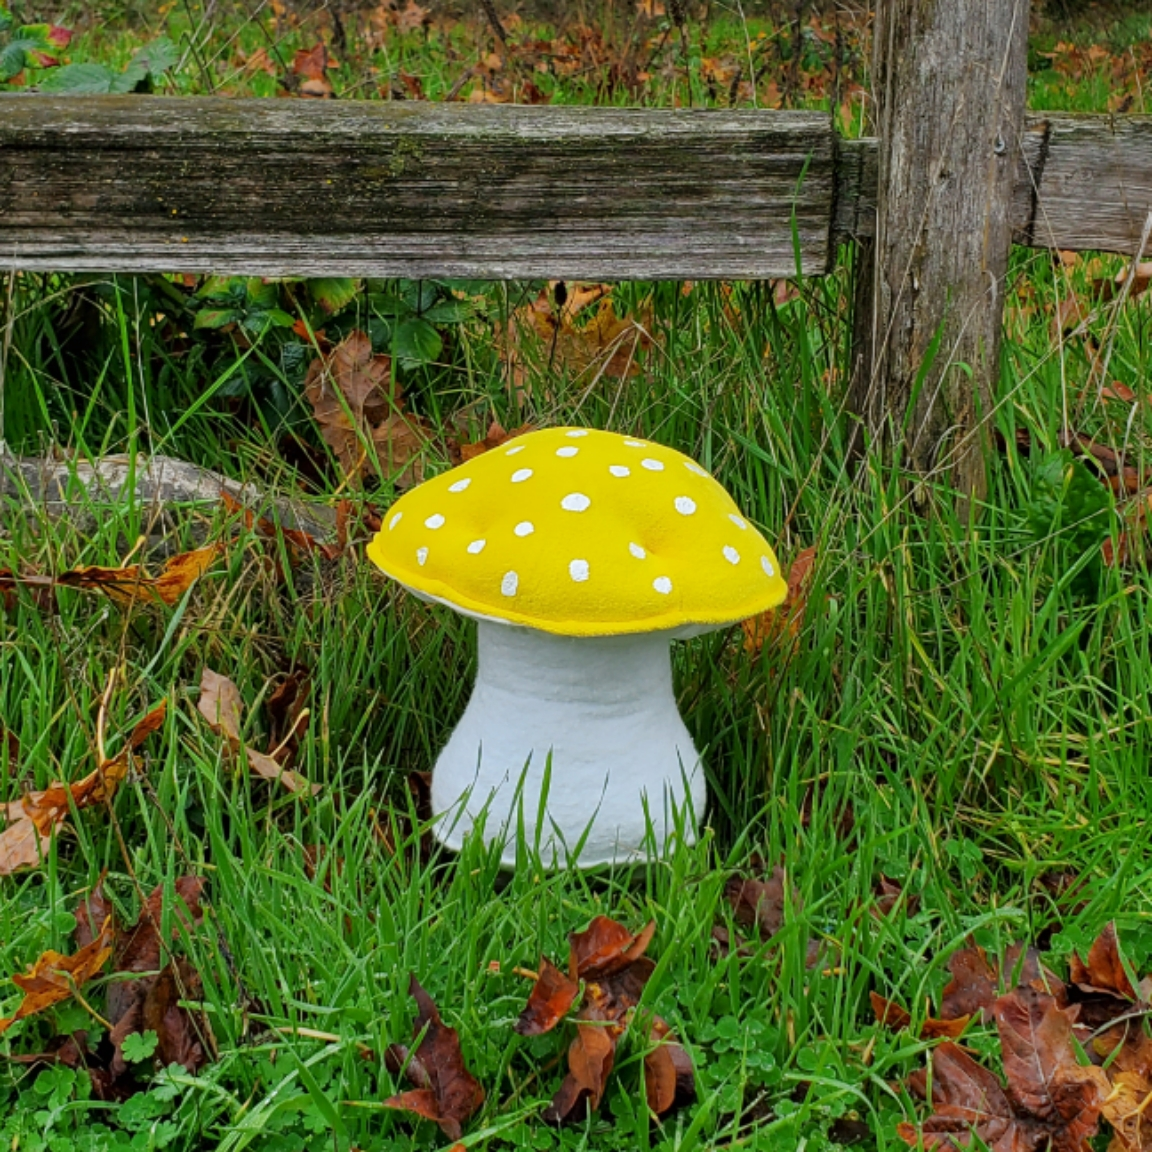 Old fence mushroom yellow amanita